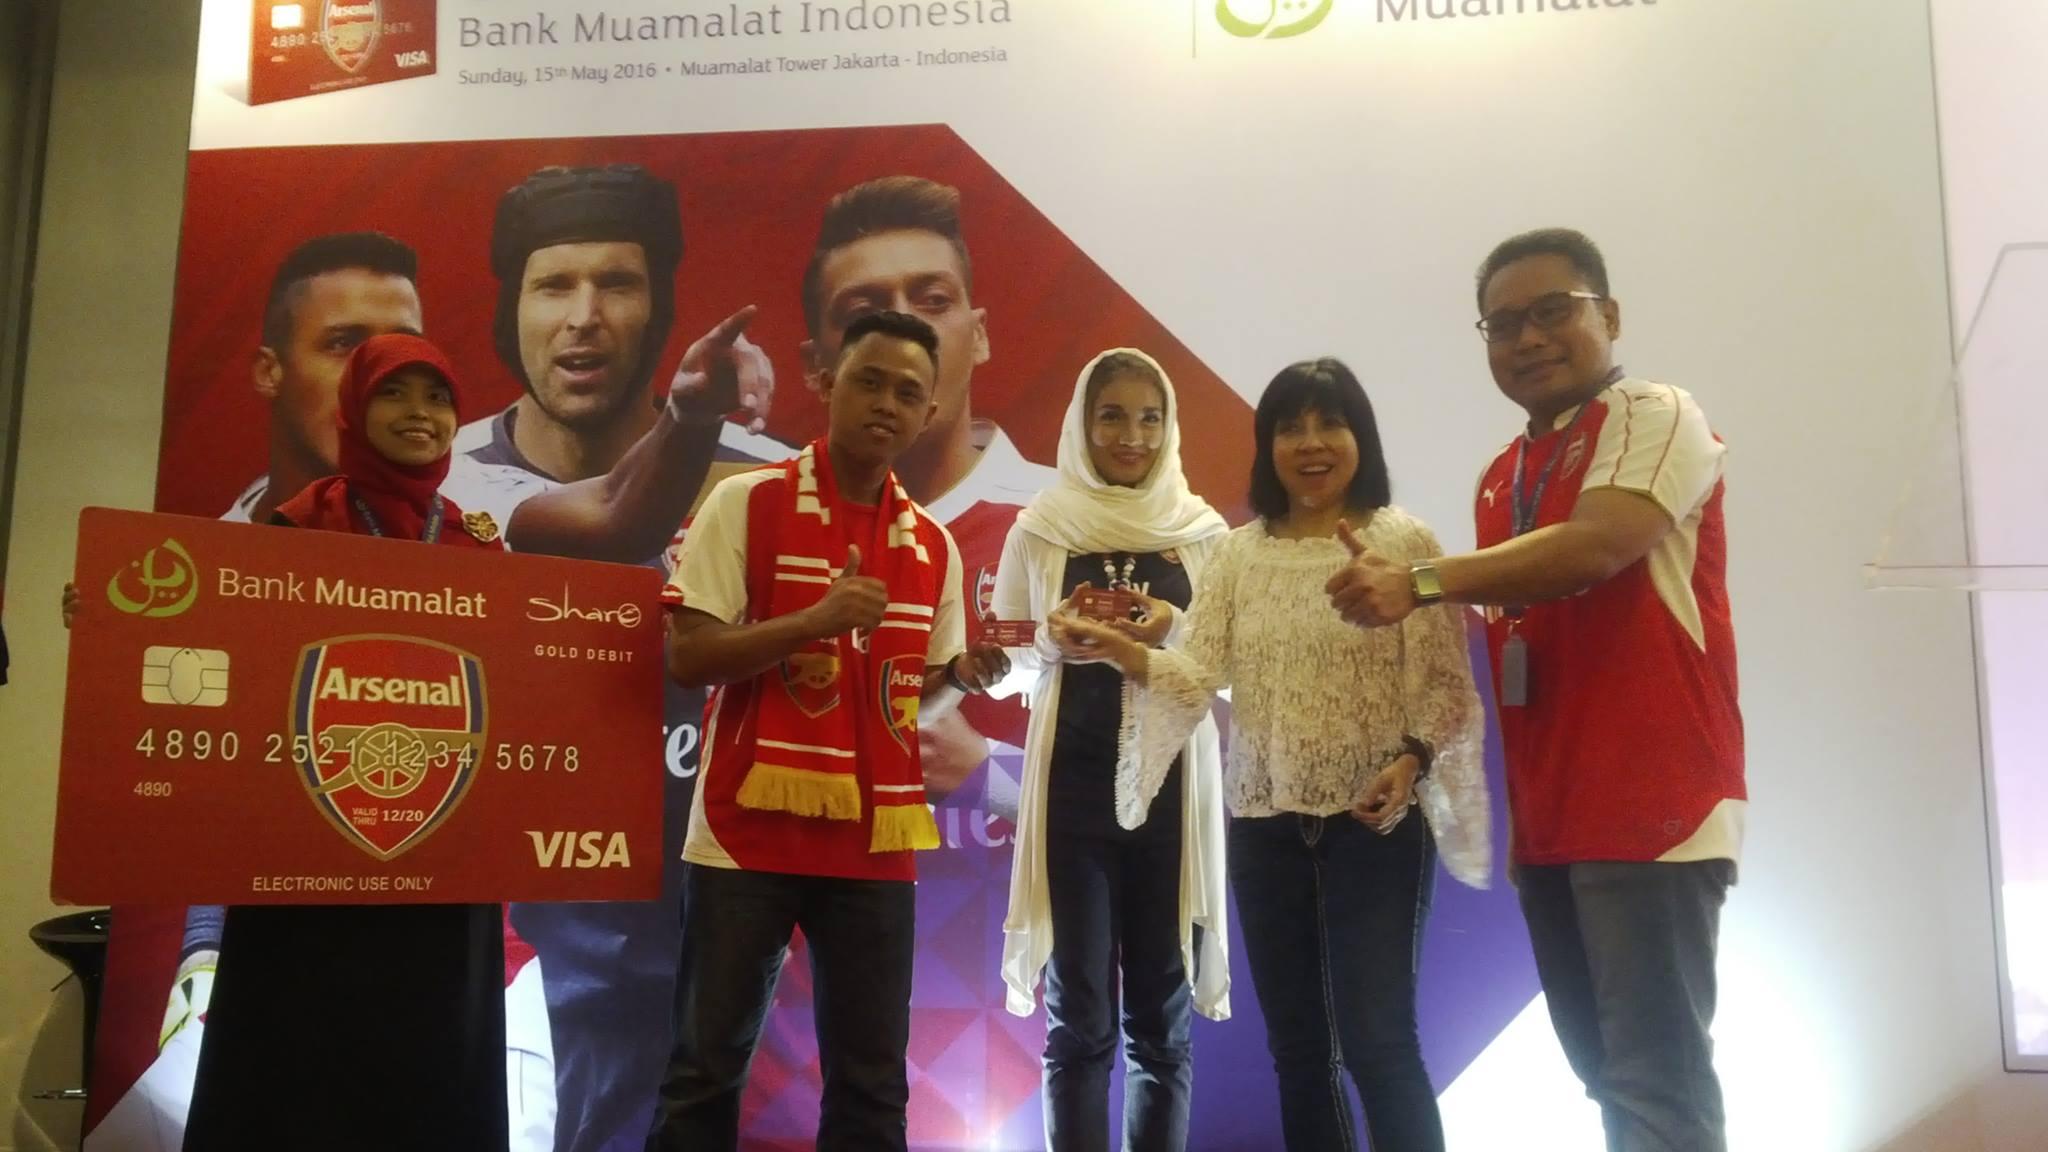 Muamalat Bersama Arsenal FC Hadirkan Co-Branding Kartu Debit